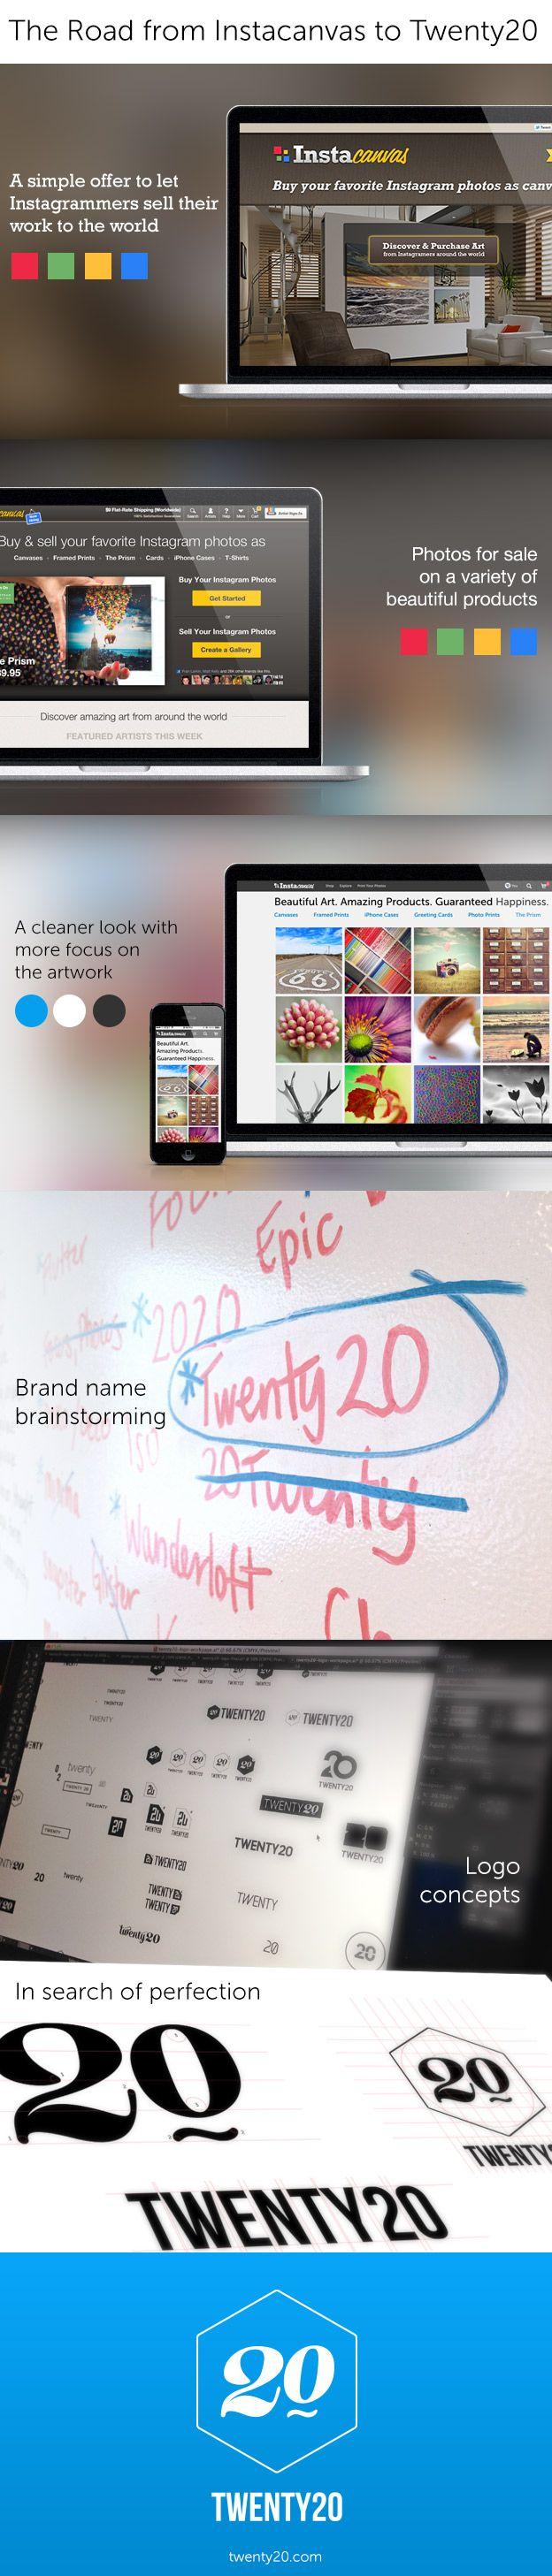 rebrand-historyhttp://svisw1.profitgram.hop.clickbank.net